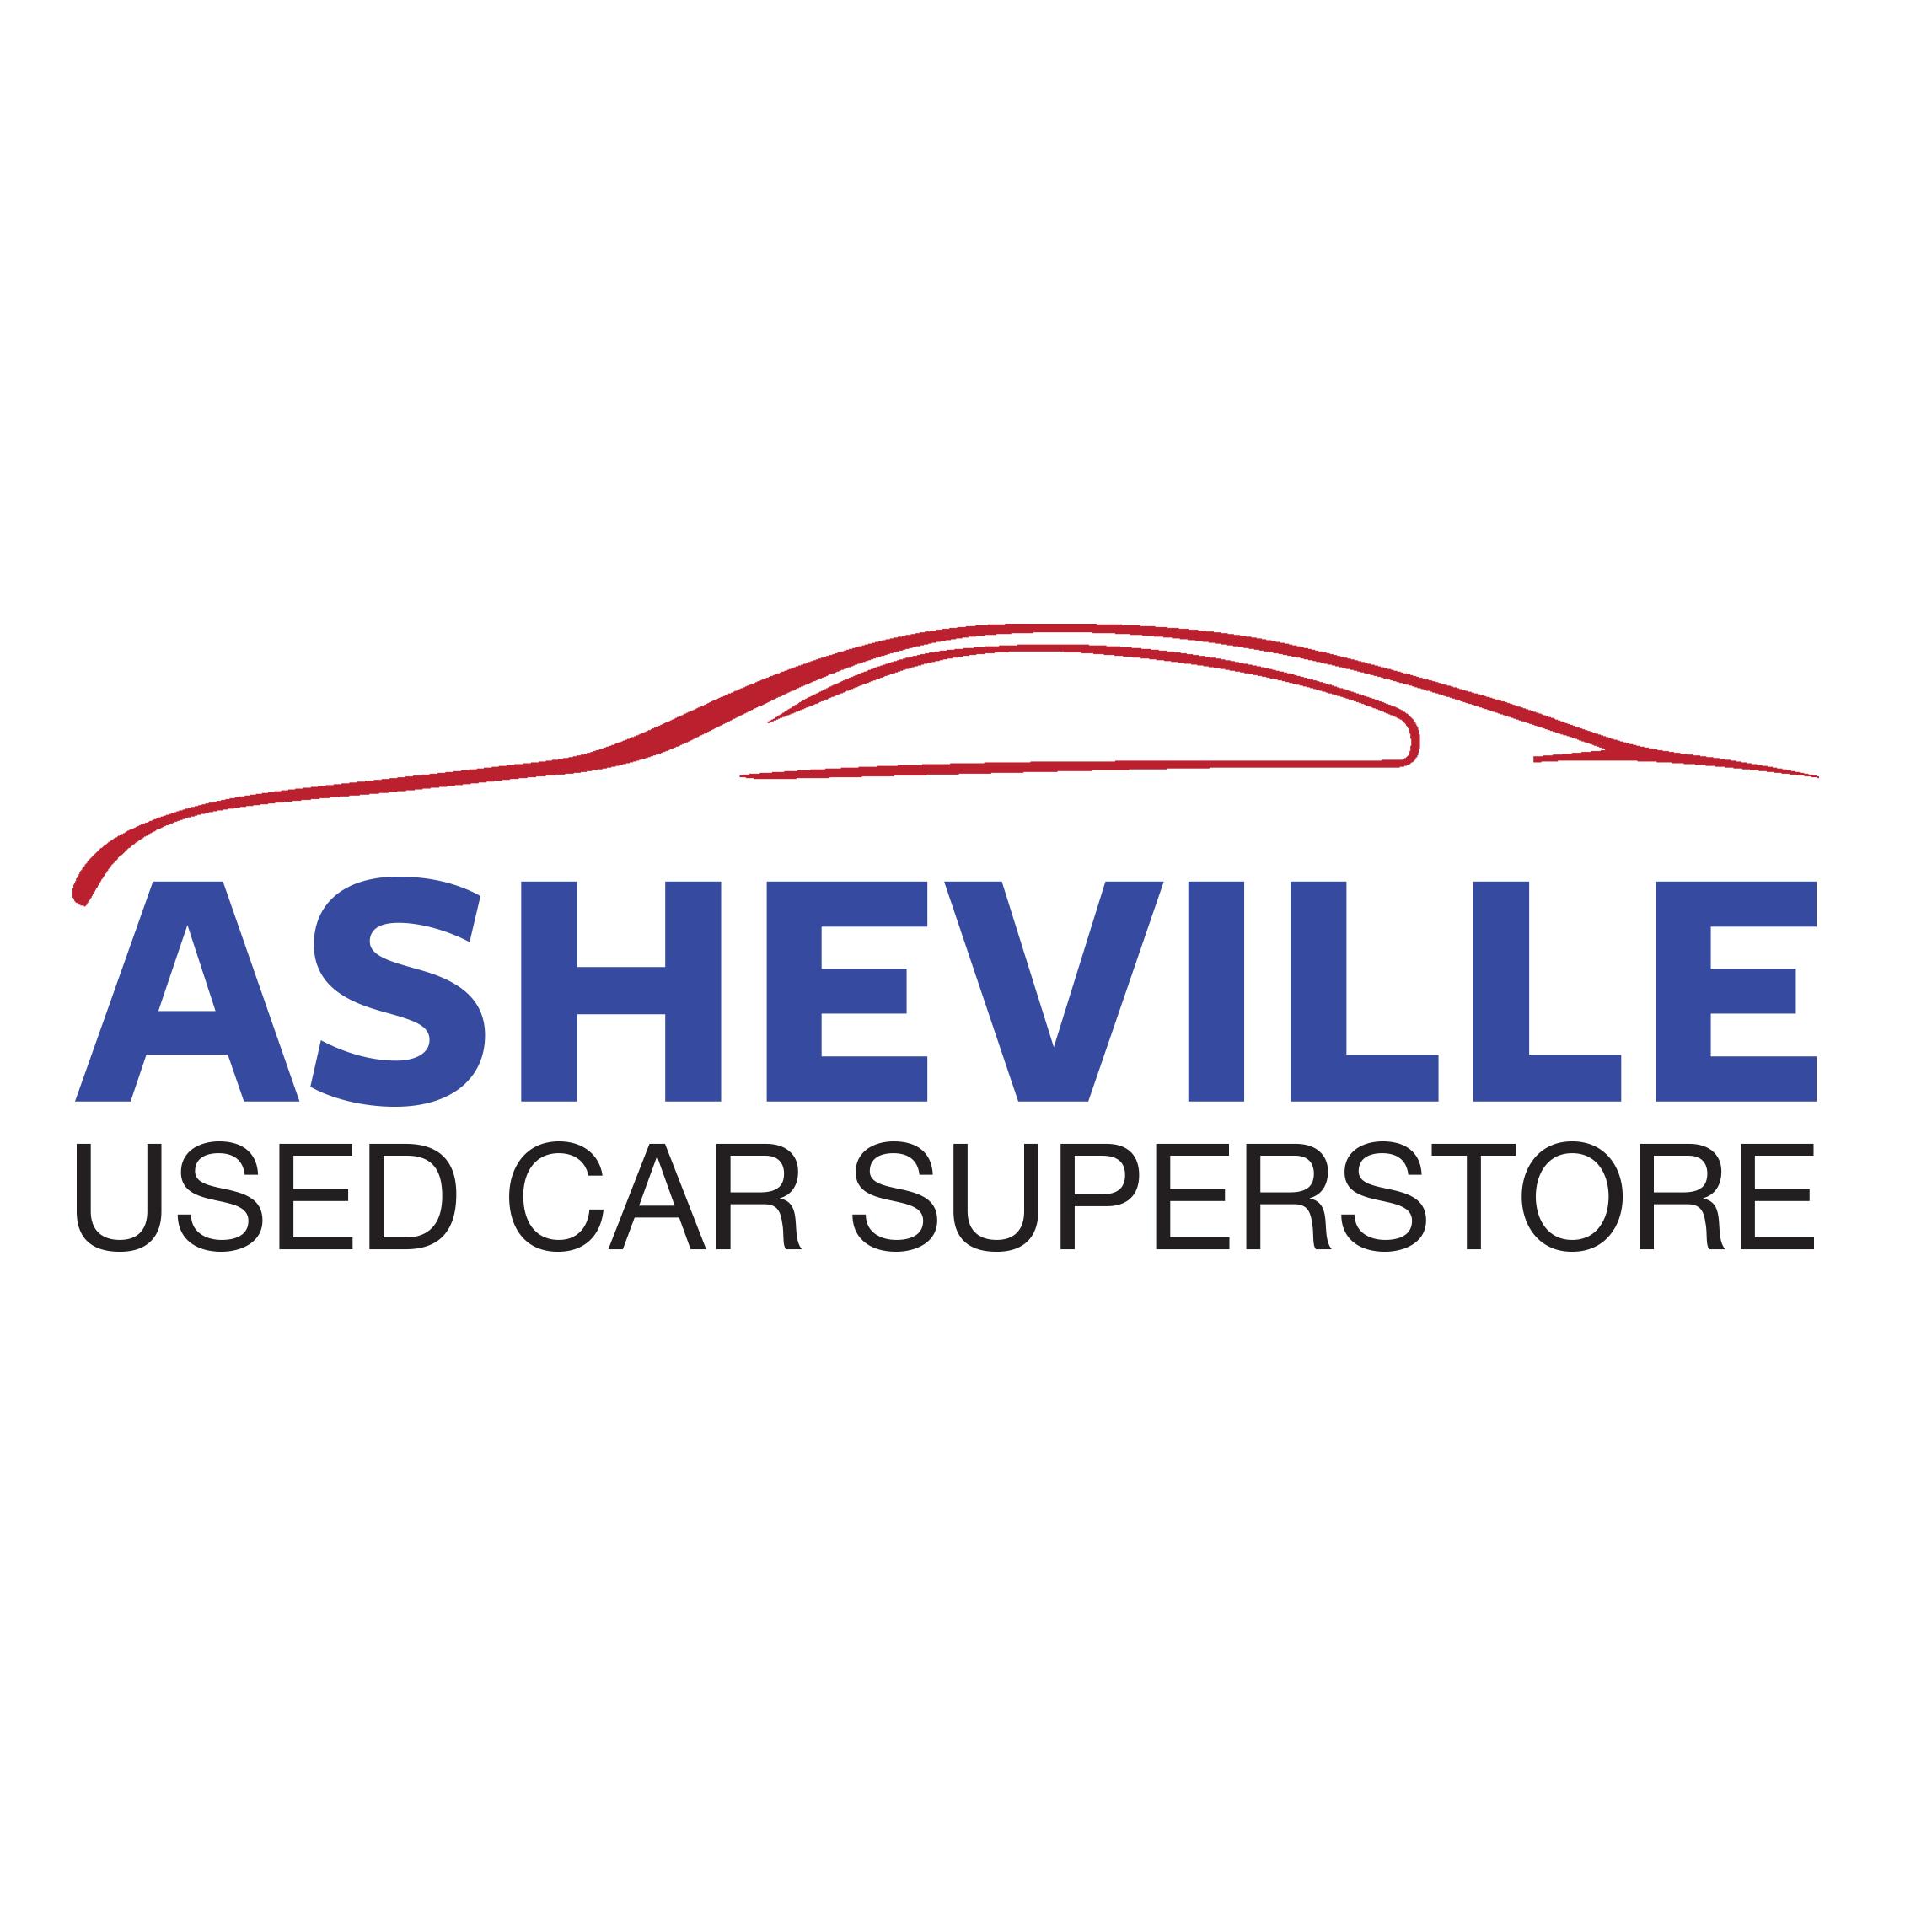 asheville used car superstore asheville nc company information. Black Bedroom Furniture Sets. Home Design Ideas